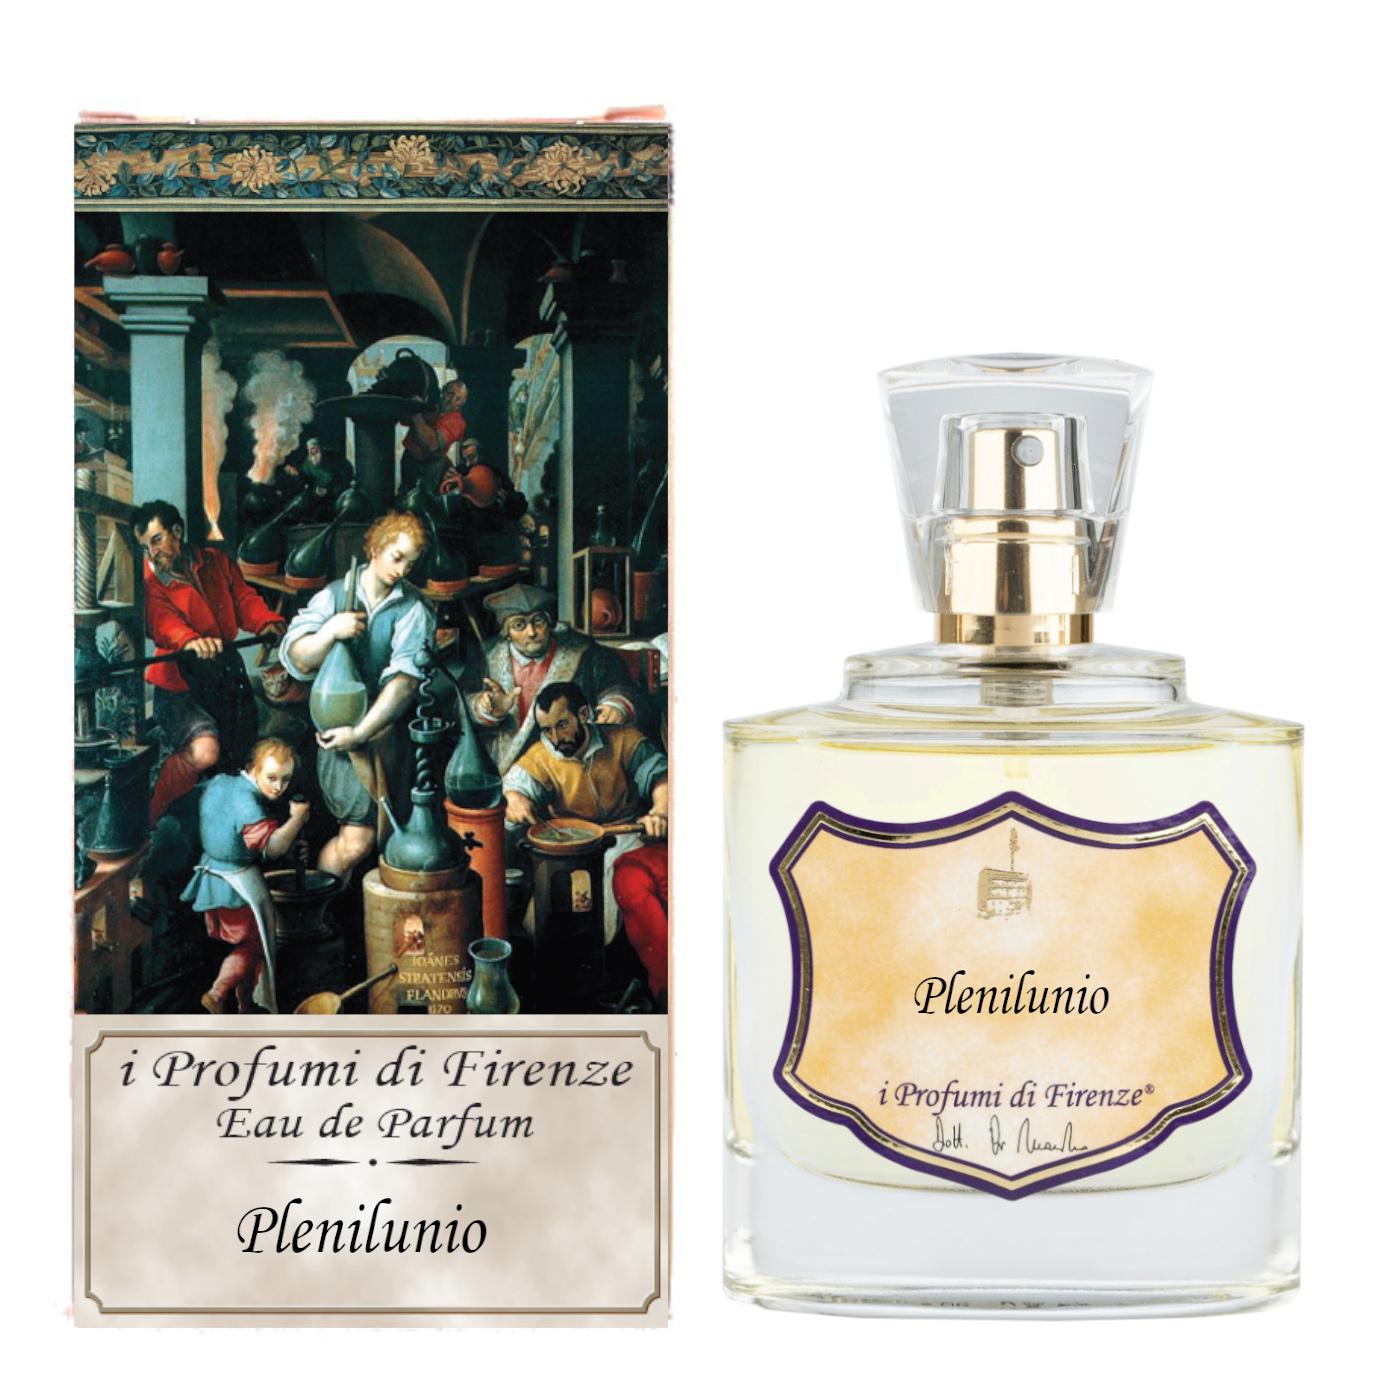 PLENILUNIO - Eau de Parfum-4105